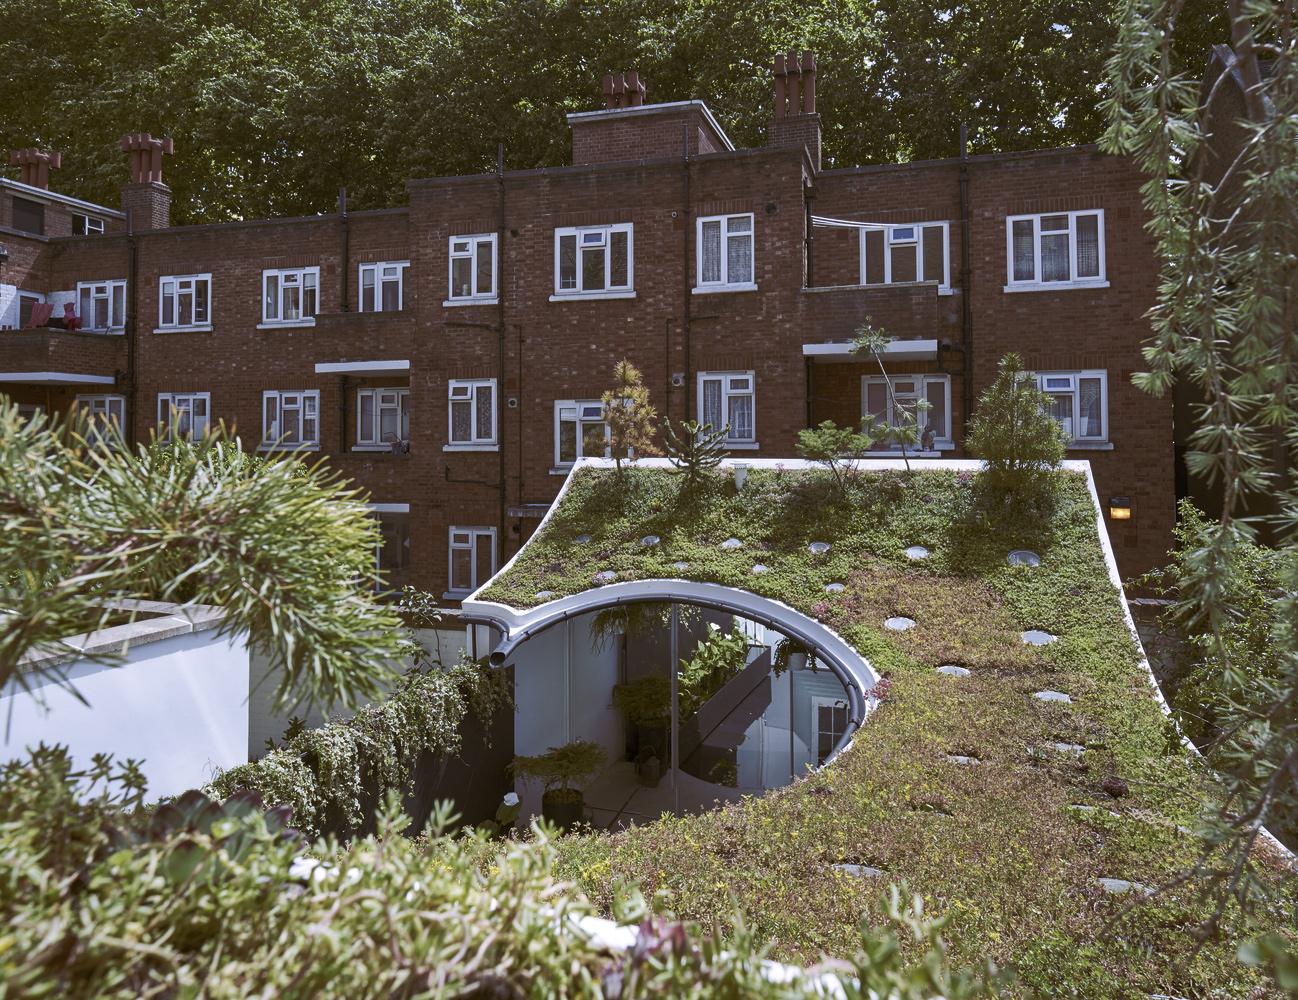 Open House London 2018 preview: Sun Rain Rooms